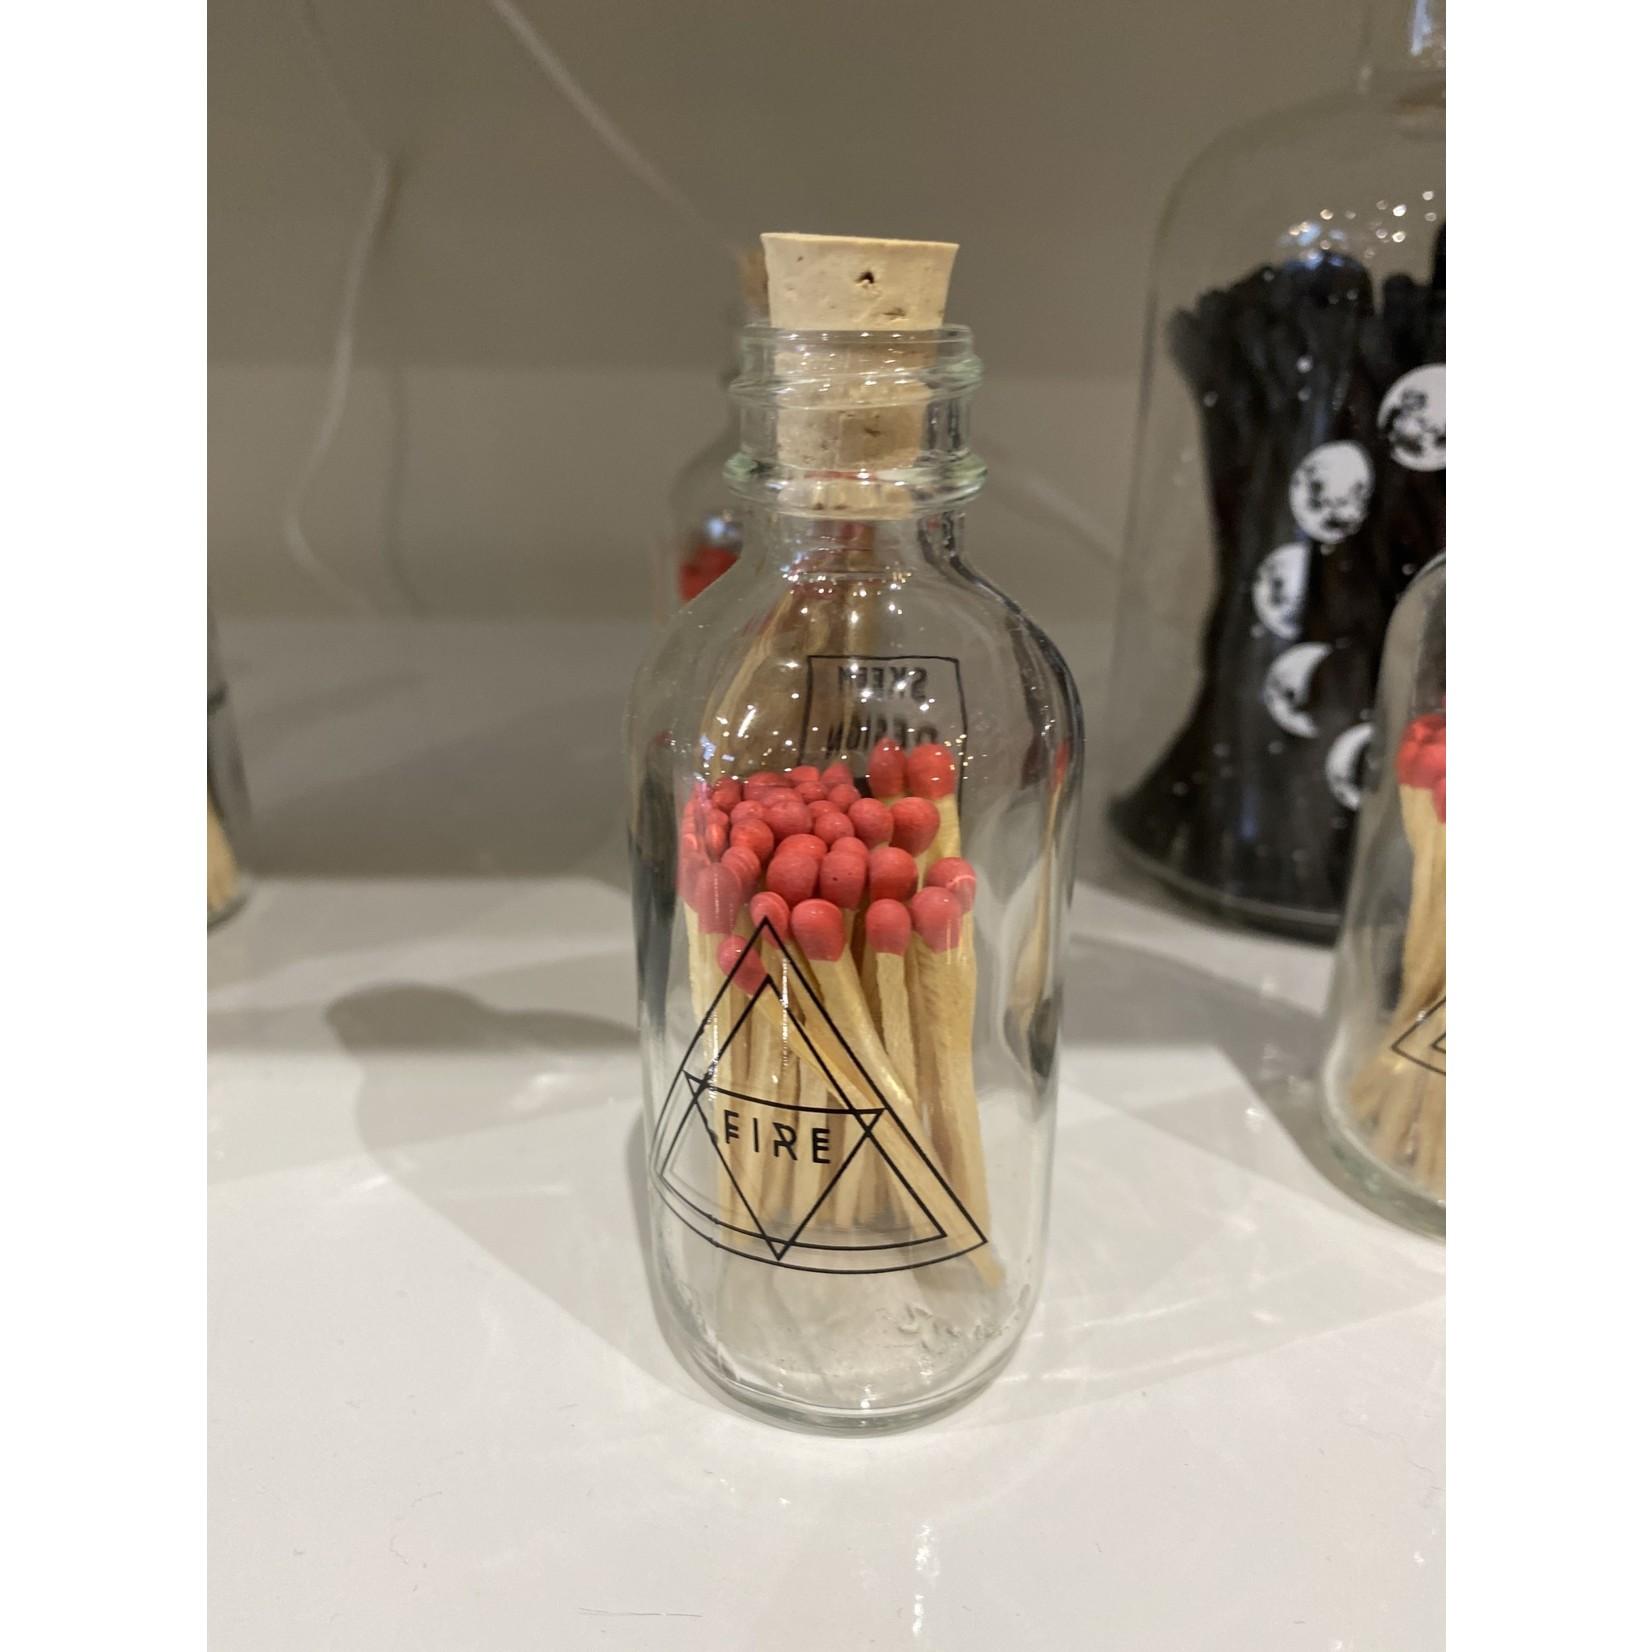 Skeem Small fire  Bottle w/wooden matches